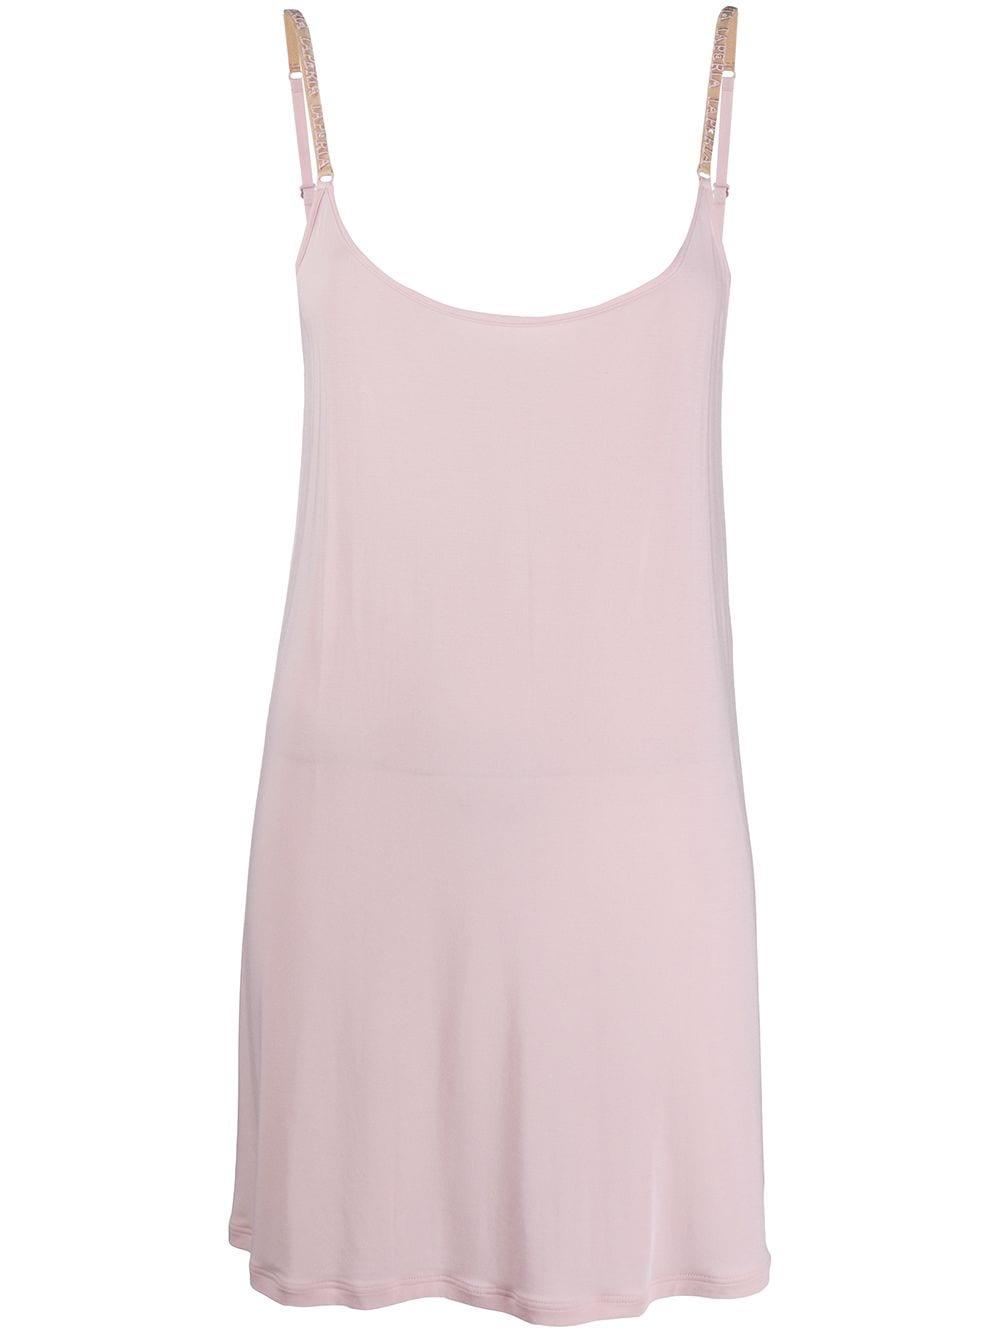 My Imagine Slip Dress